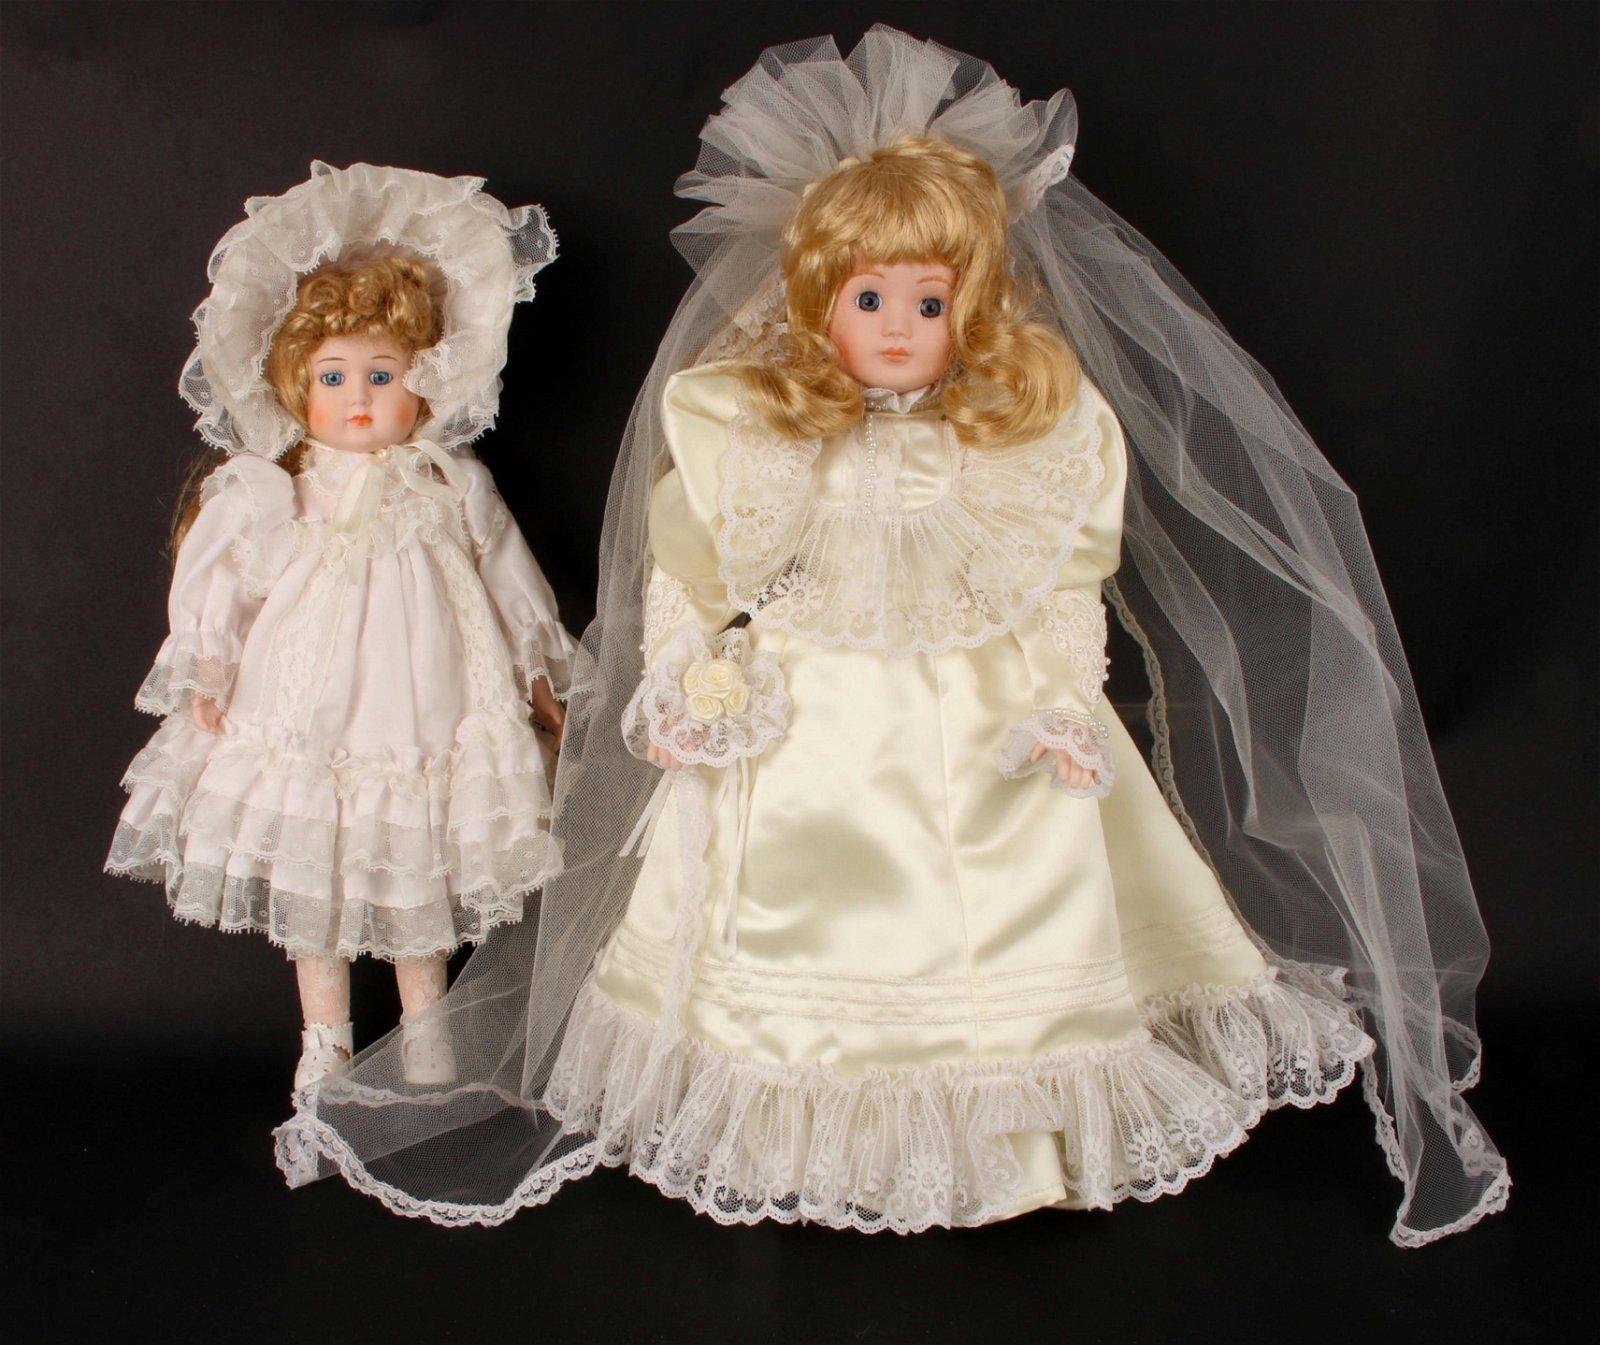 2 PORCELAIN DOLLS BRIDE VICTORIAN CHILD MUSIC BOX